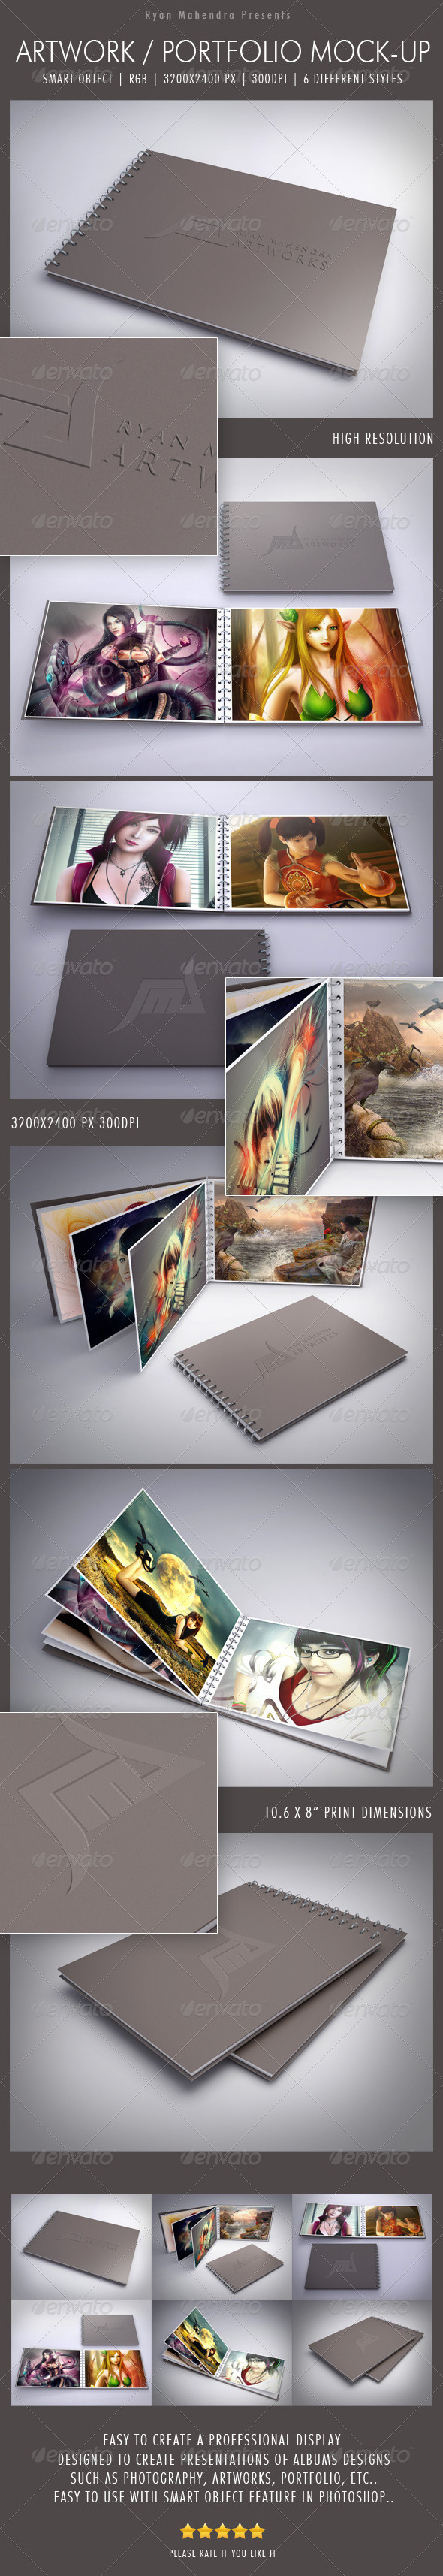 Artwork / Portfolio Mock-Up - Books Print